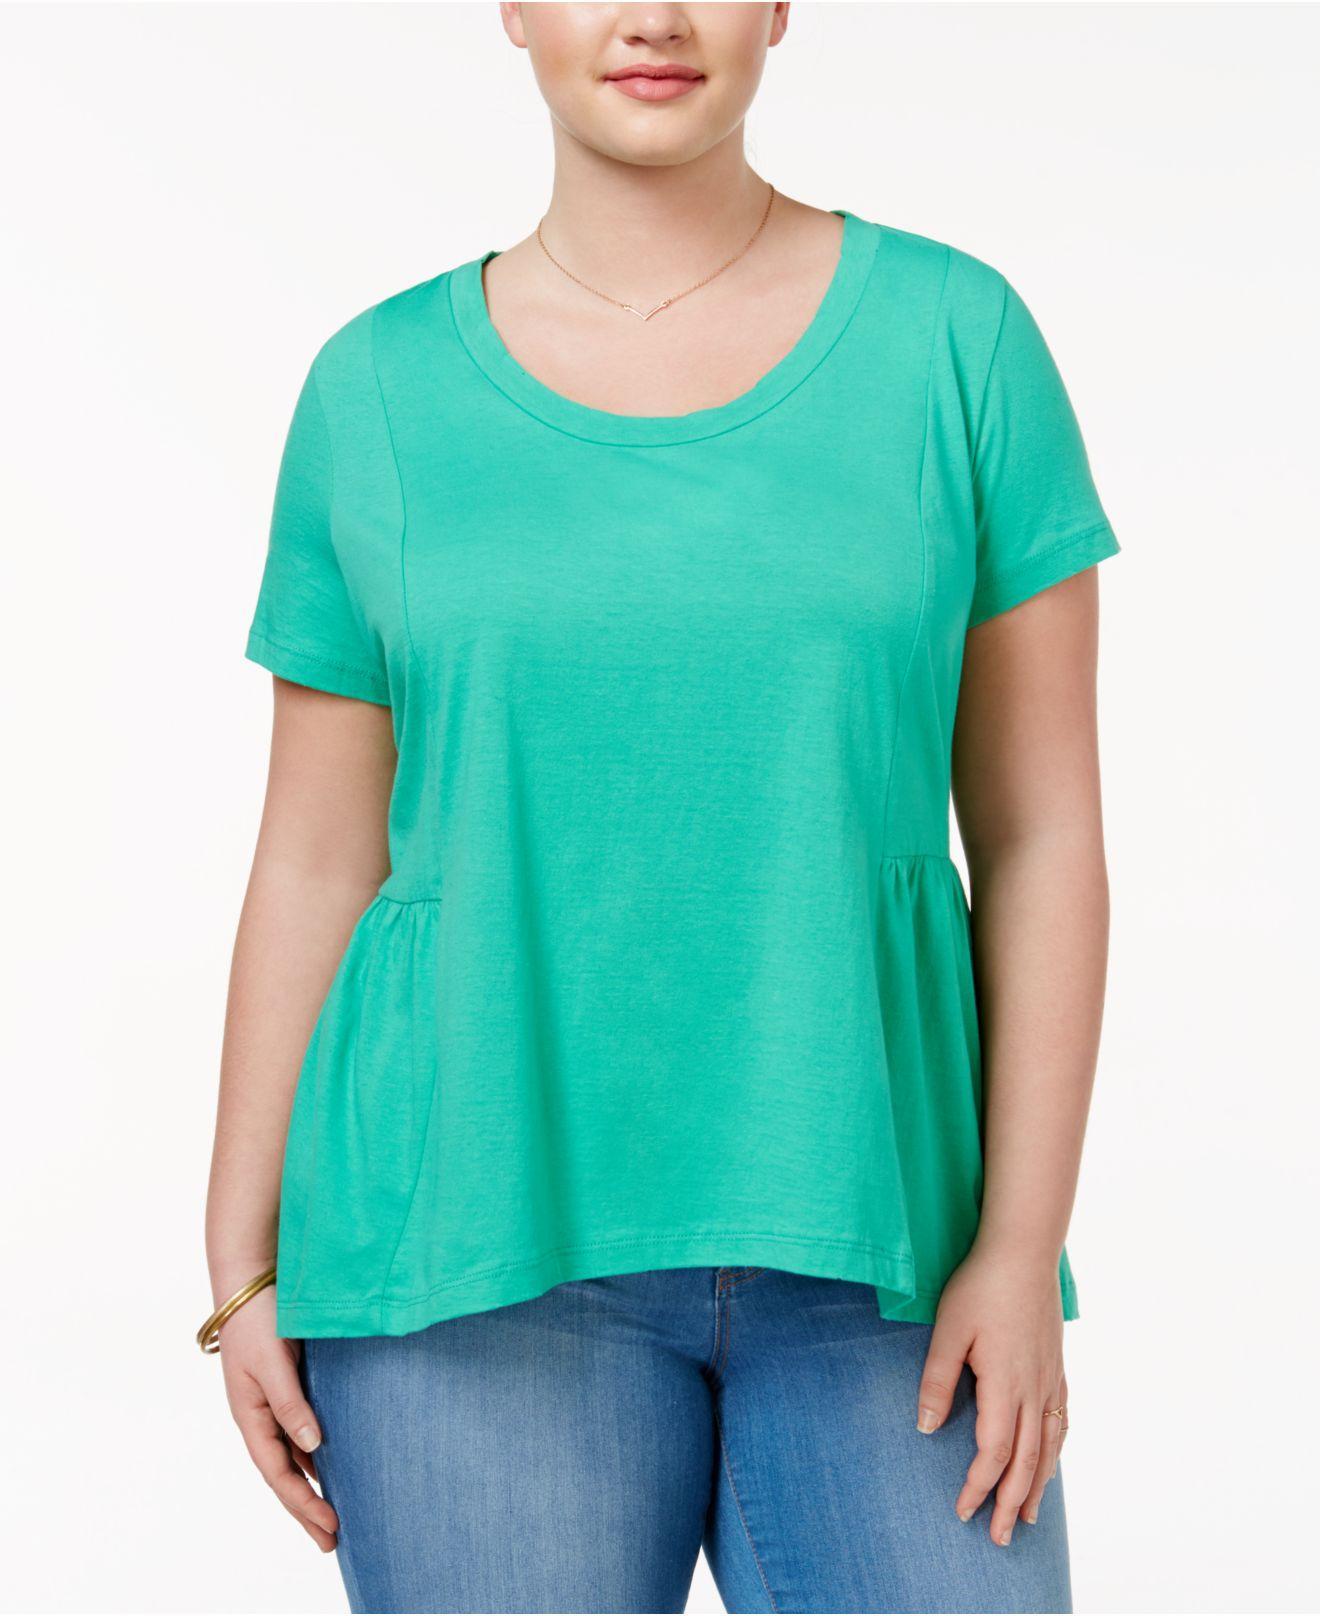 American Rag Trendy Plus Size Cotton Peplum T Shirt In